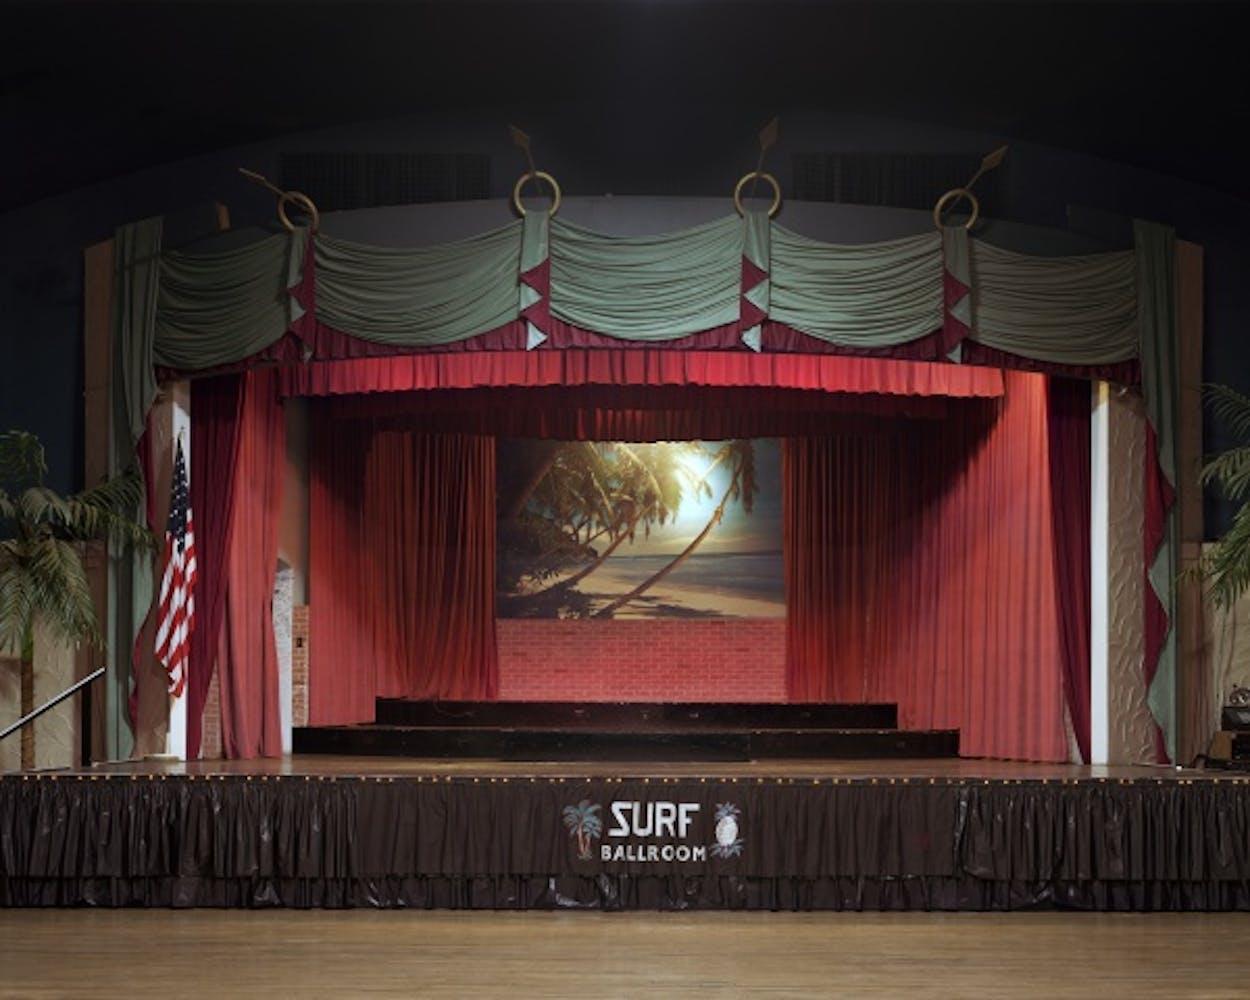 Alec Soth, Surf Ballroom, 1999